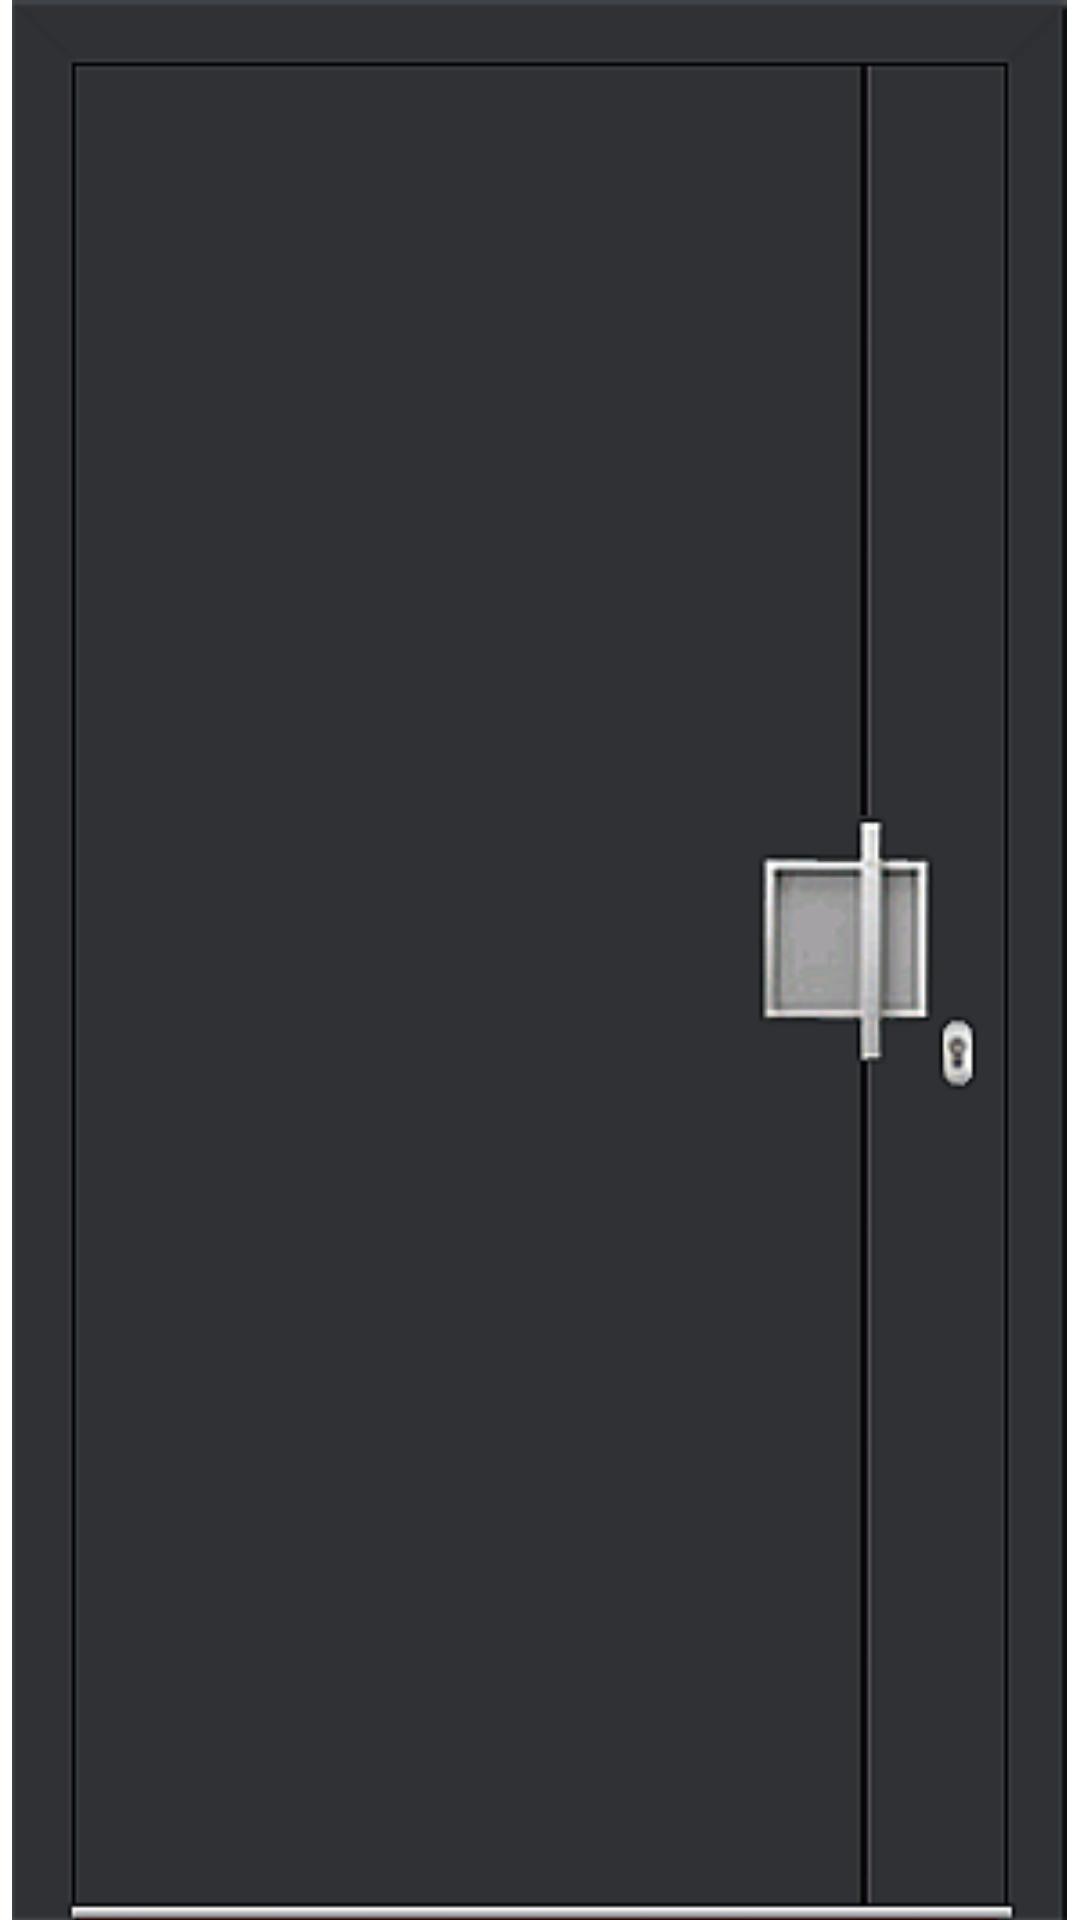 Aluminium Haustür Modell 6971-92 schwarz